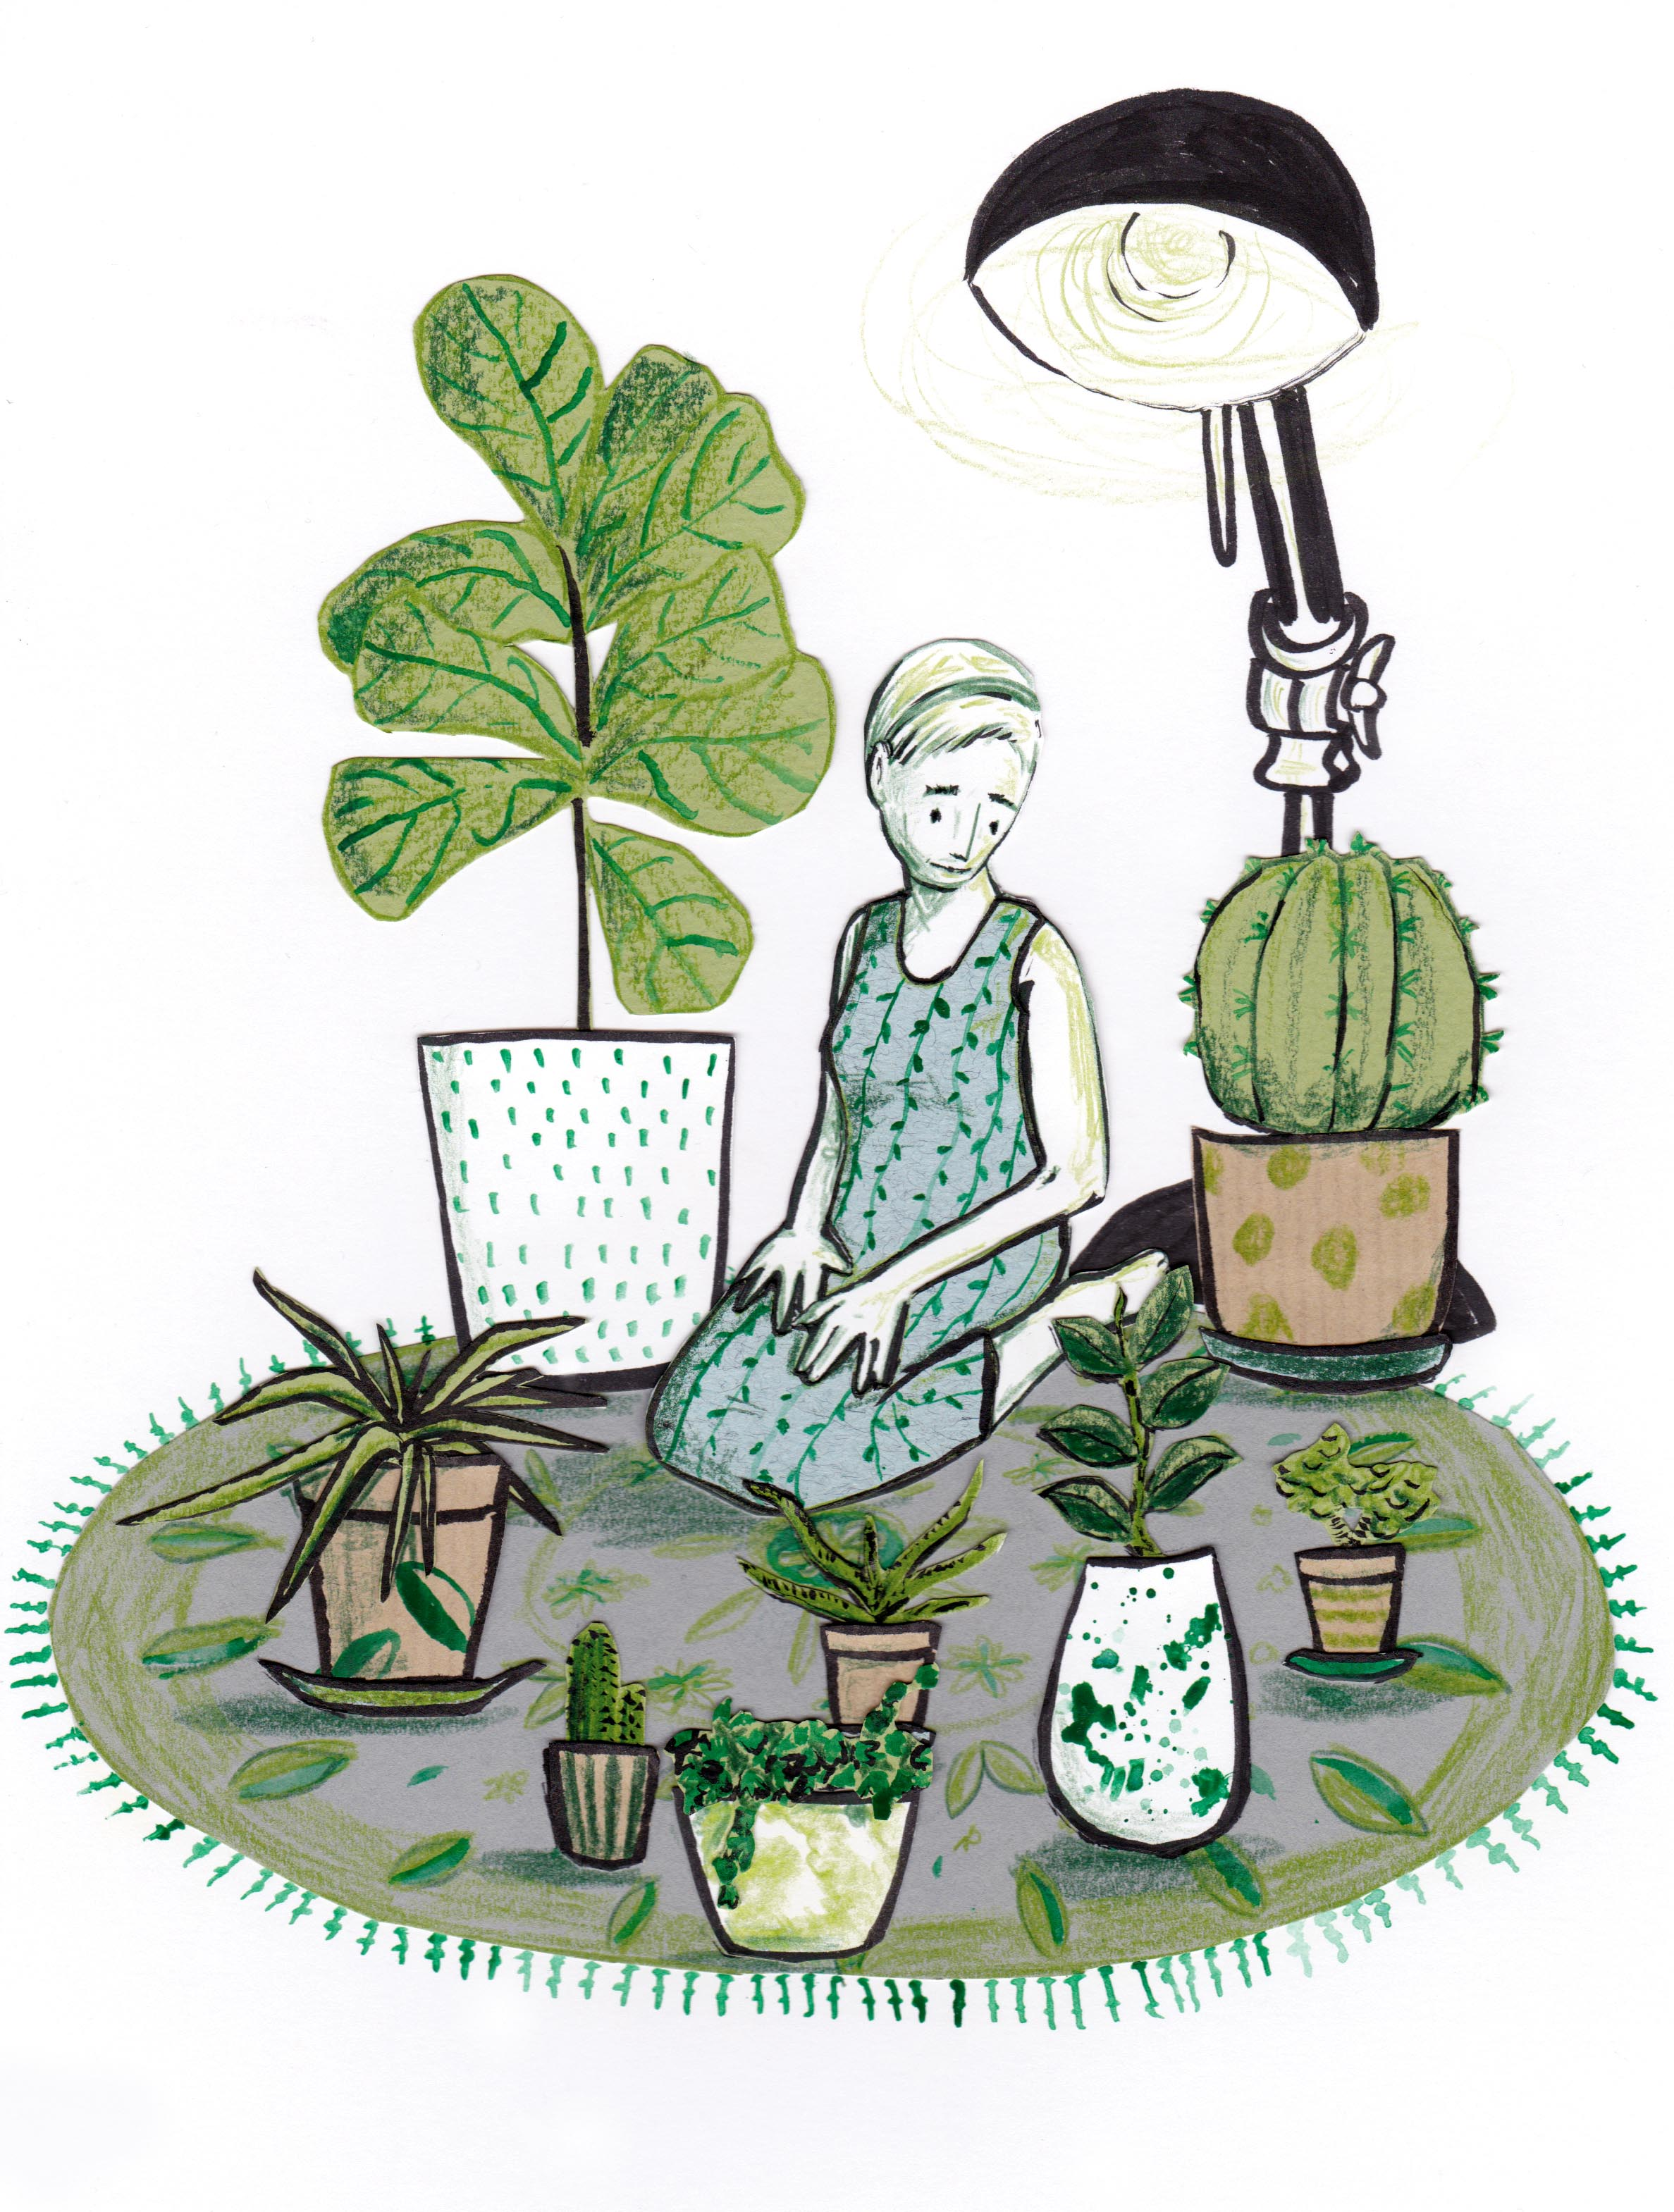 Chloe-Elise-Dennis-Plants-Carpet-2017.jpg